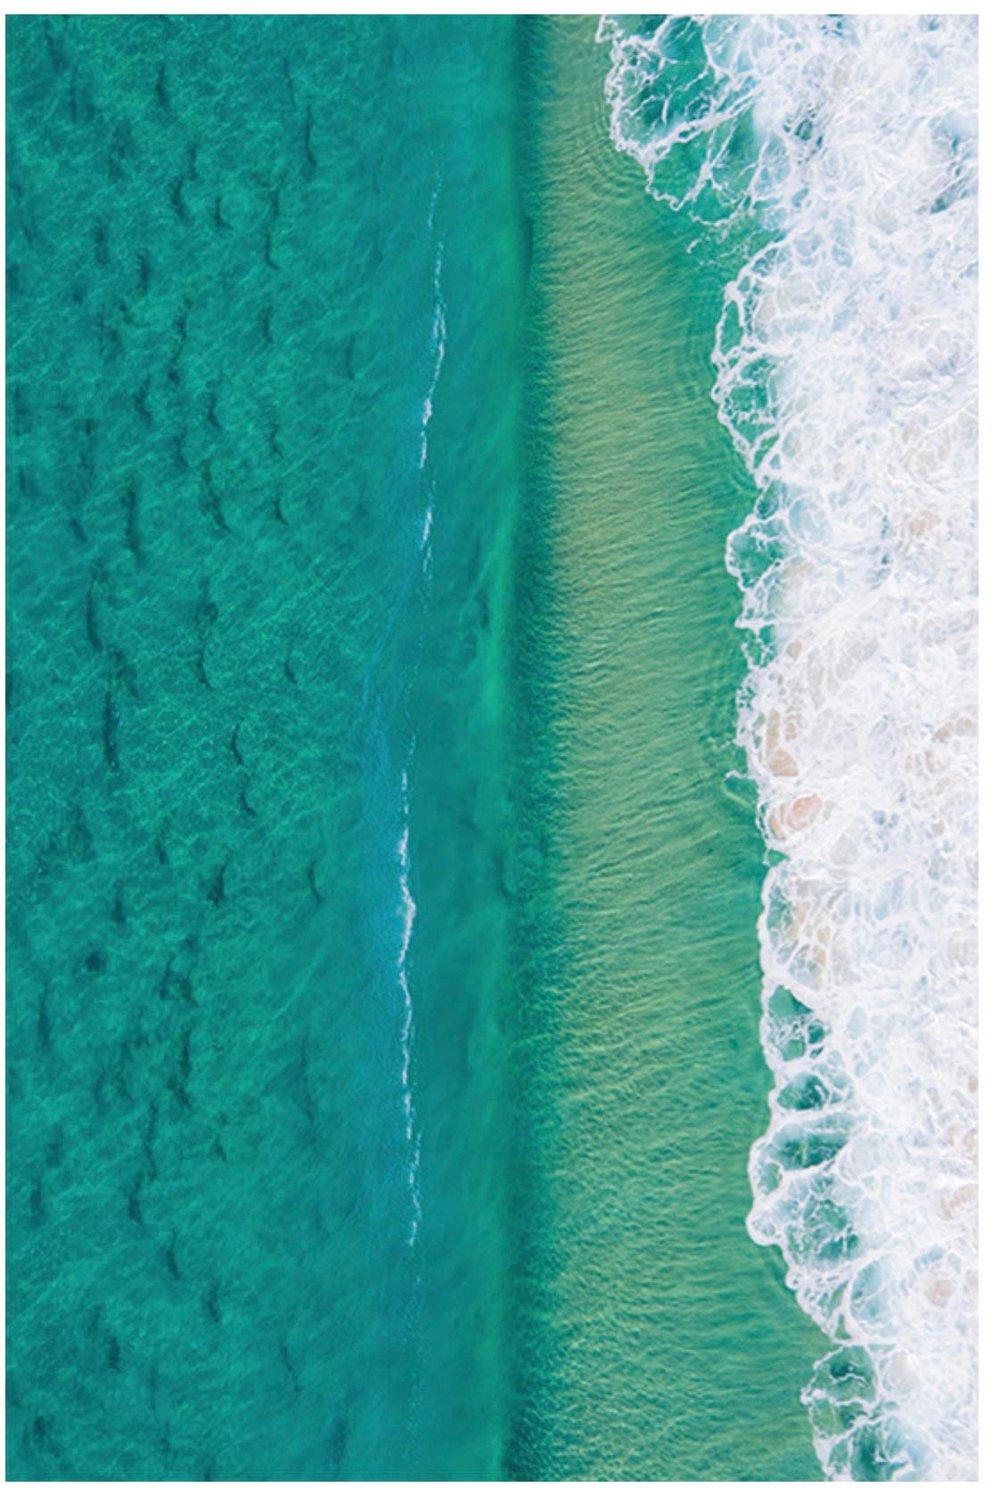 rodd-owen-ocean-surf-photography-for-sale-145.jpg